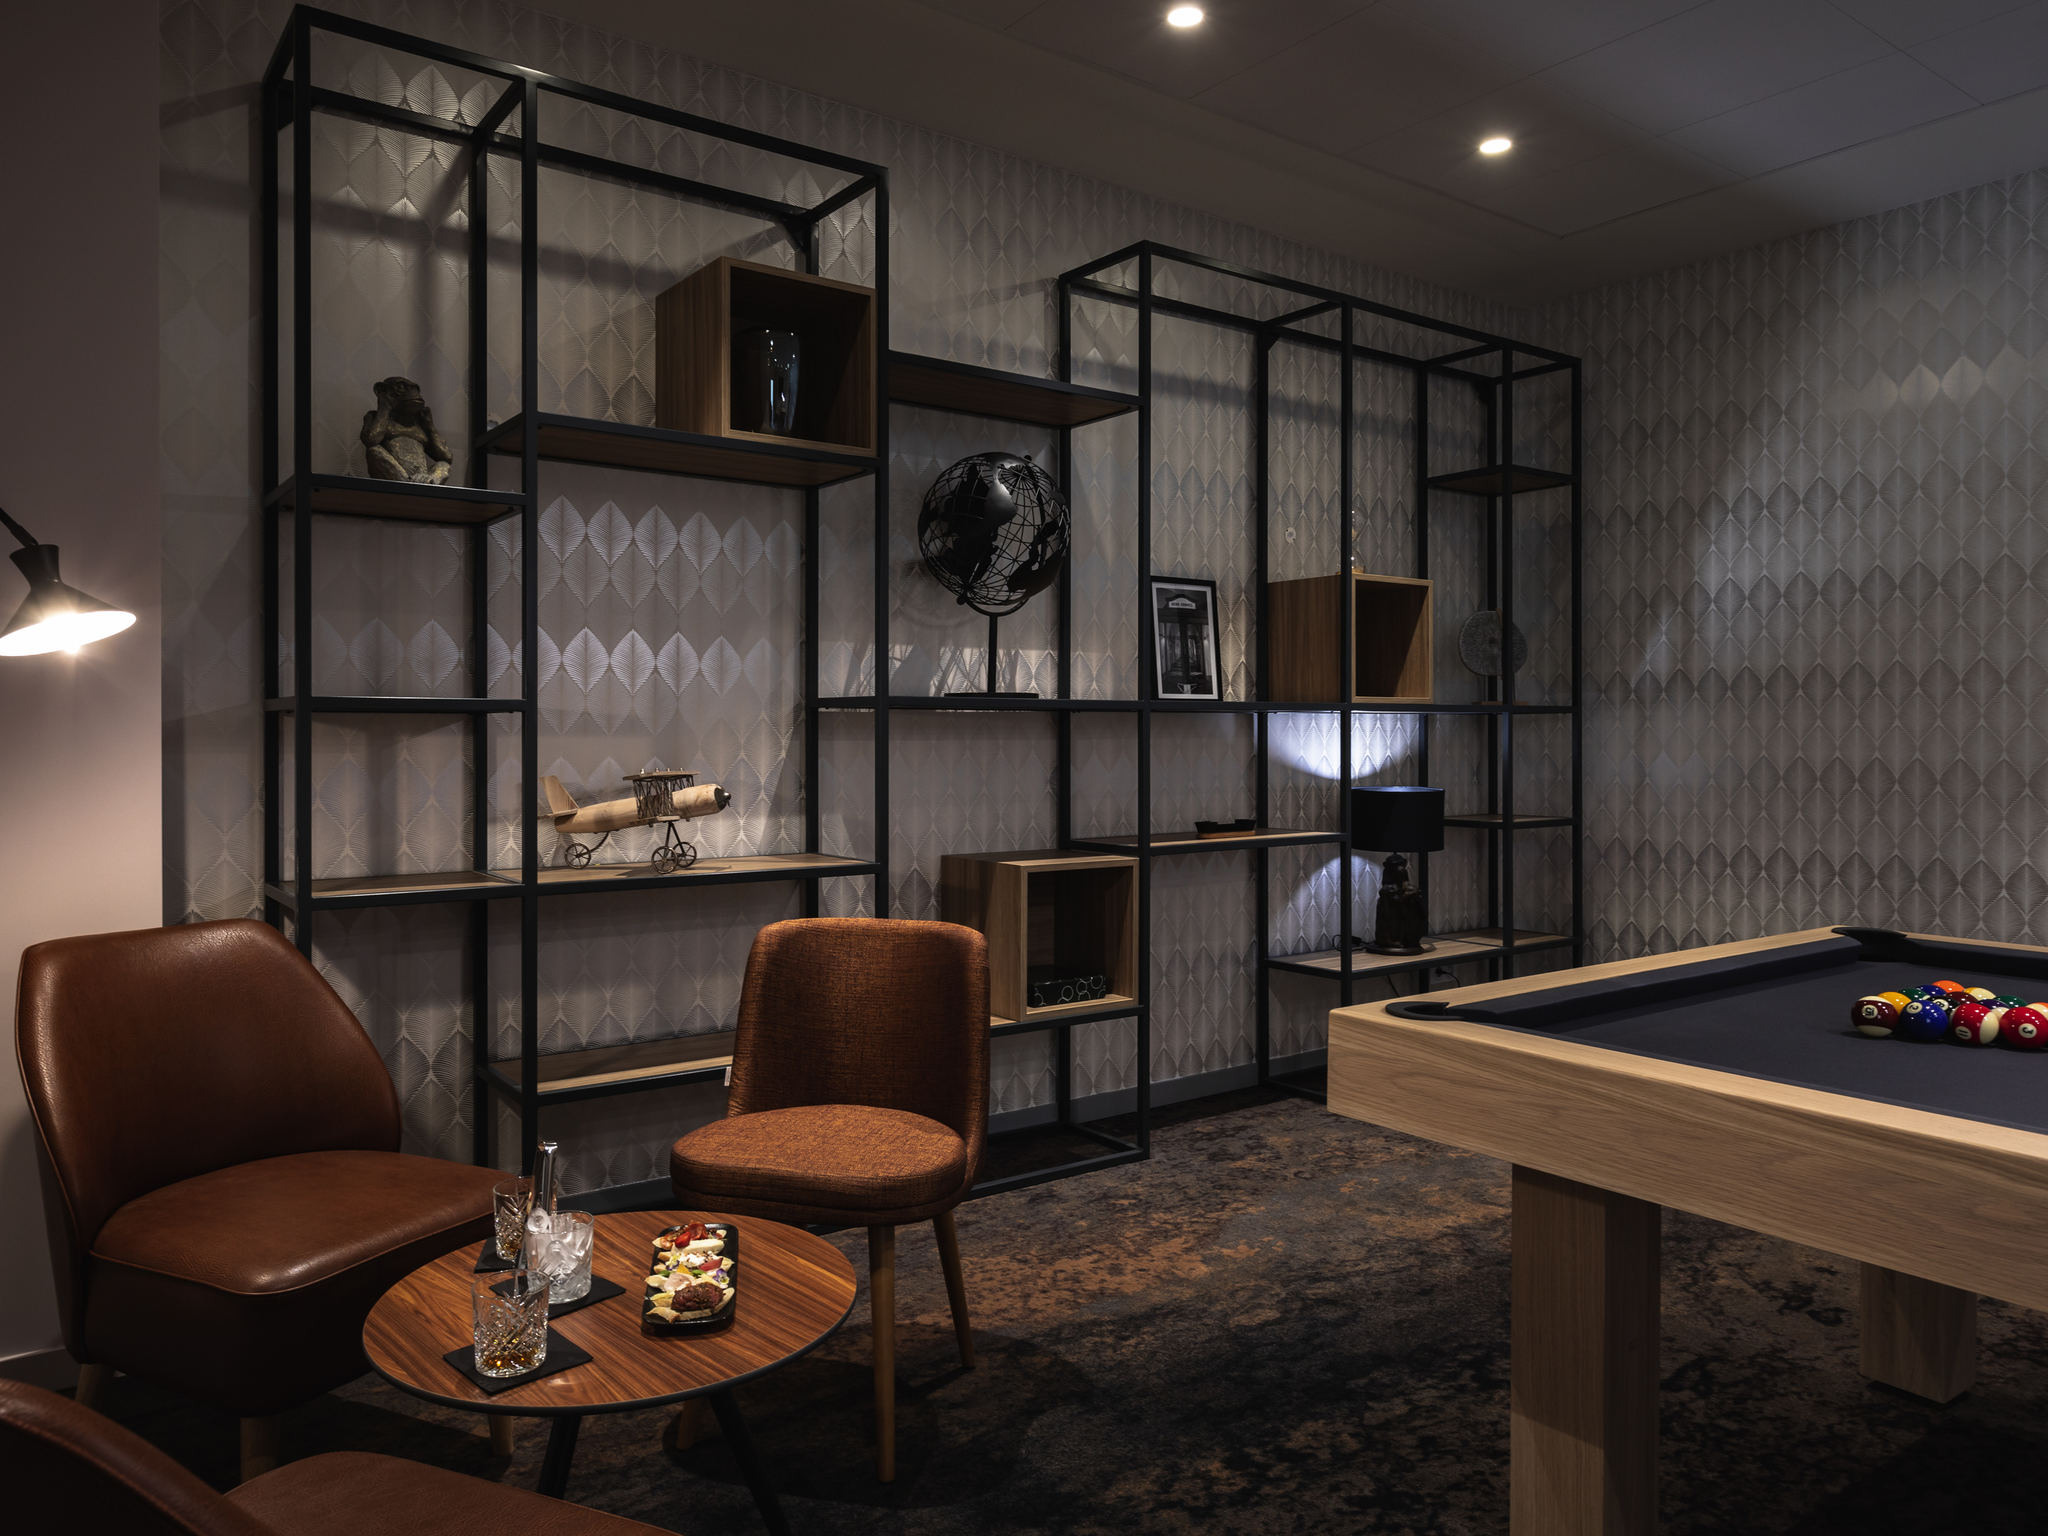 ... Hotel   Mercure Hotel U0026 Spa Aix Les Bains Domaine Marlioz ...